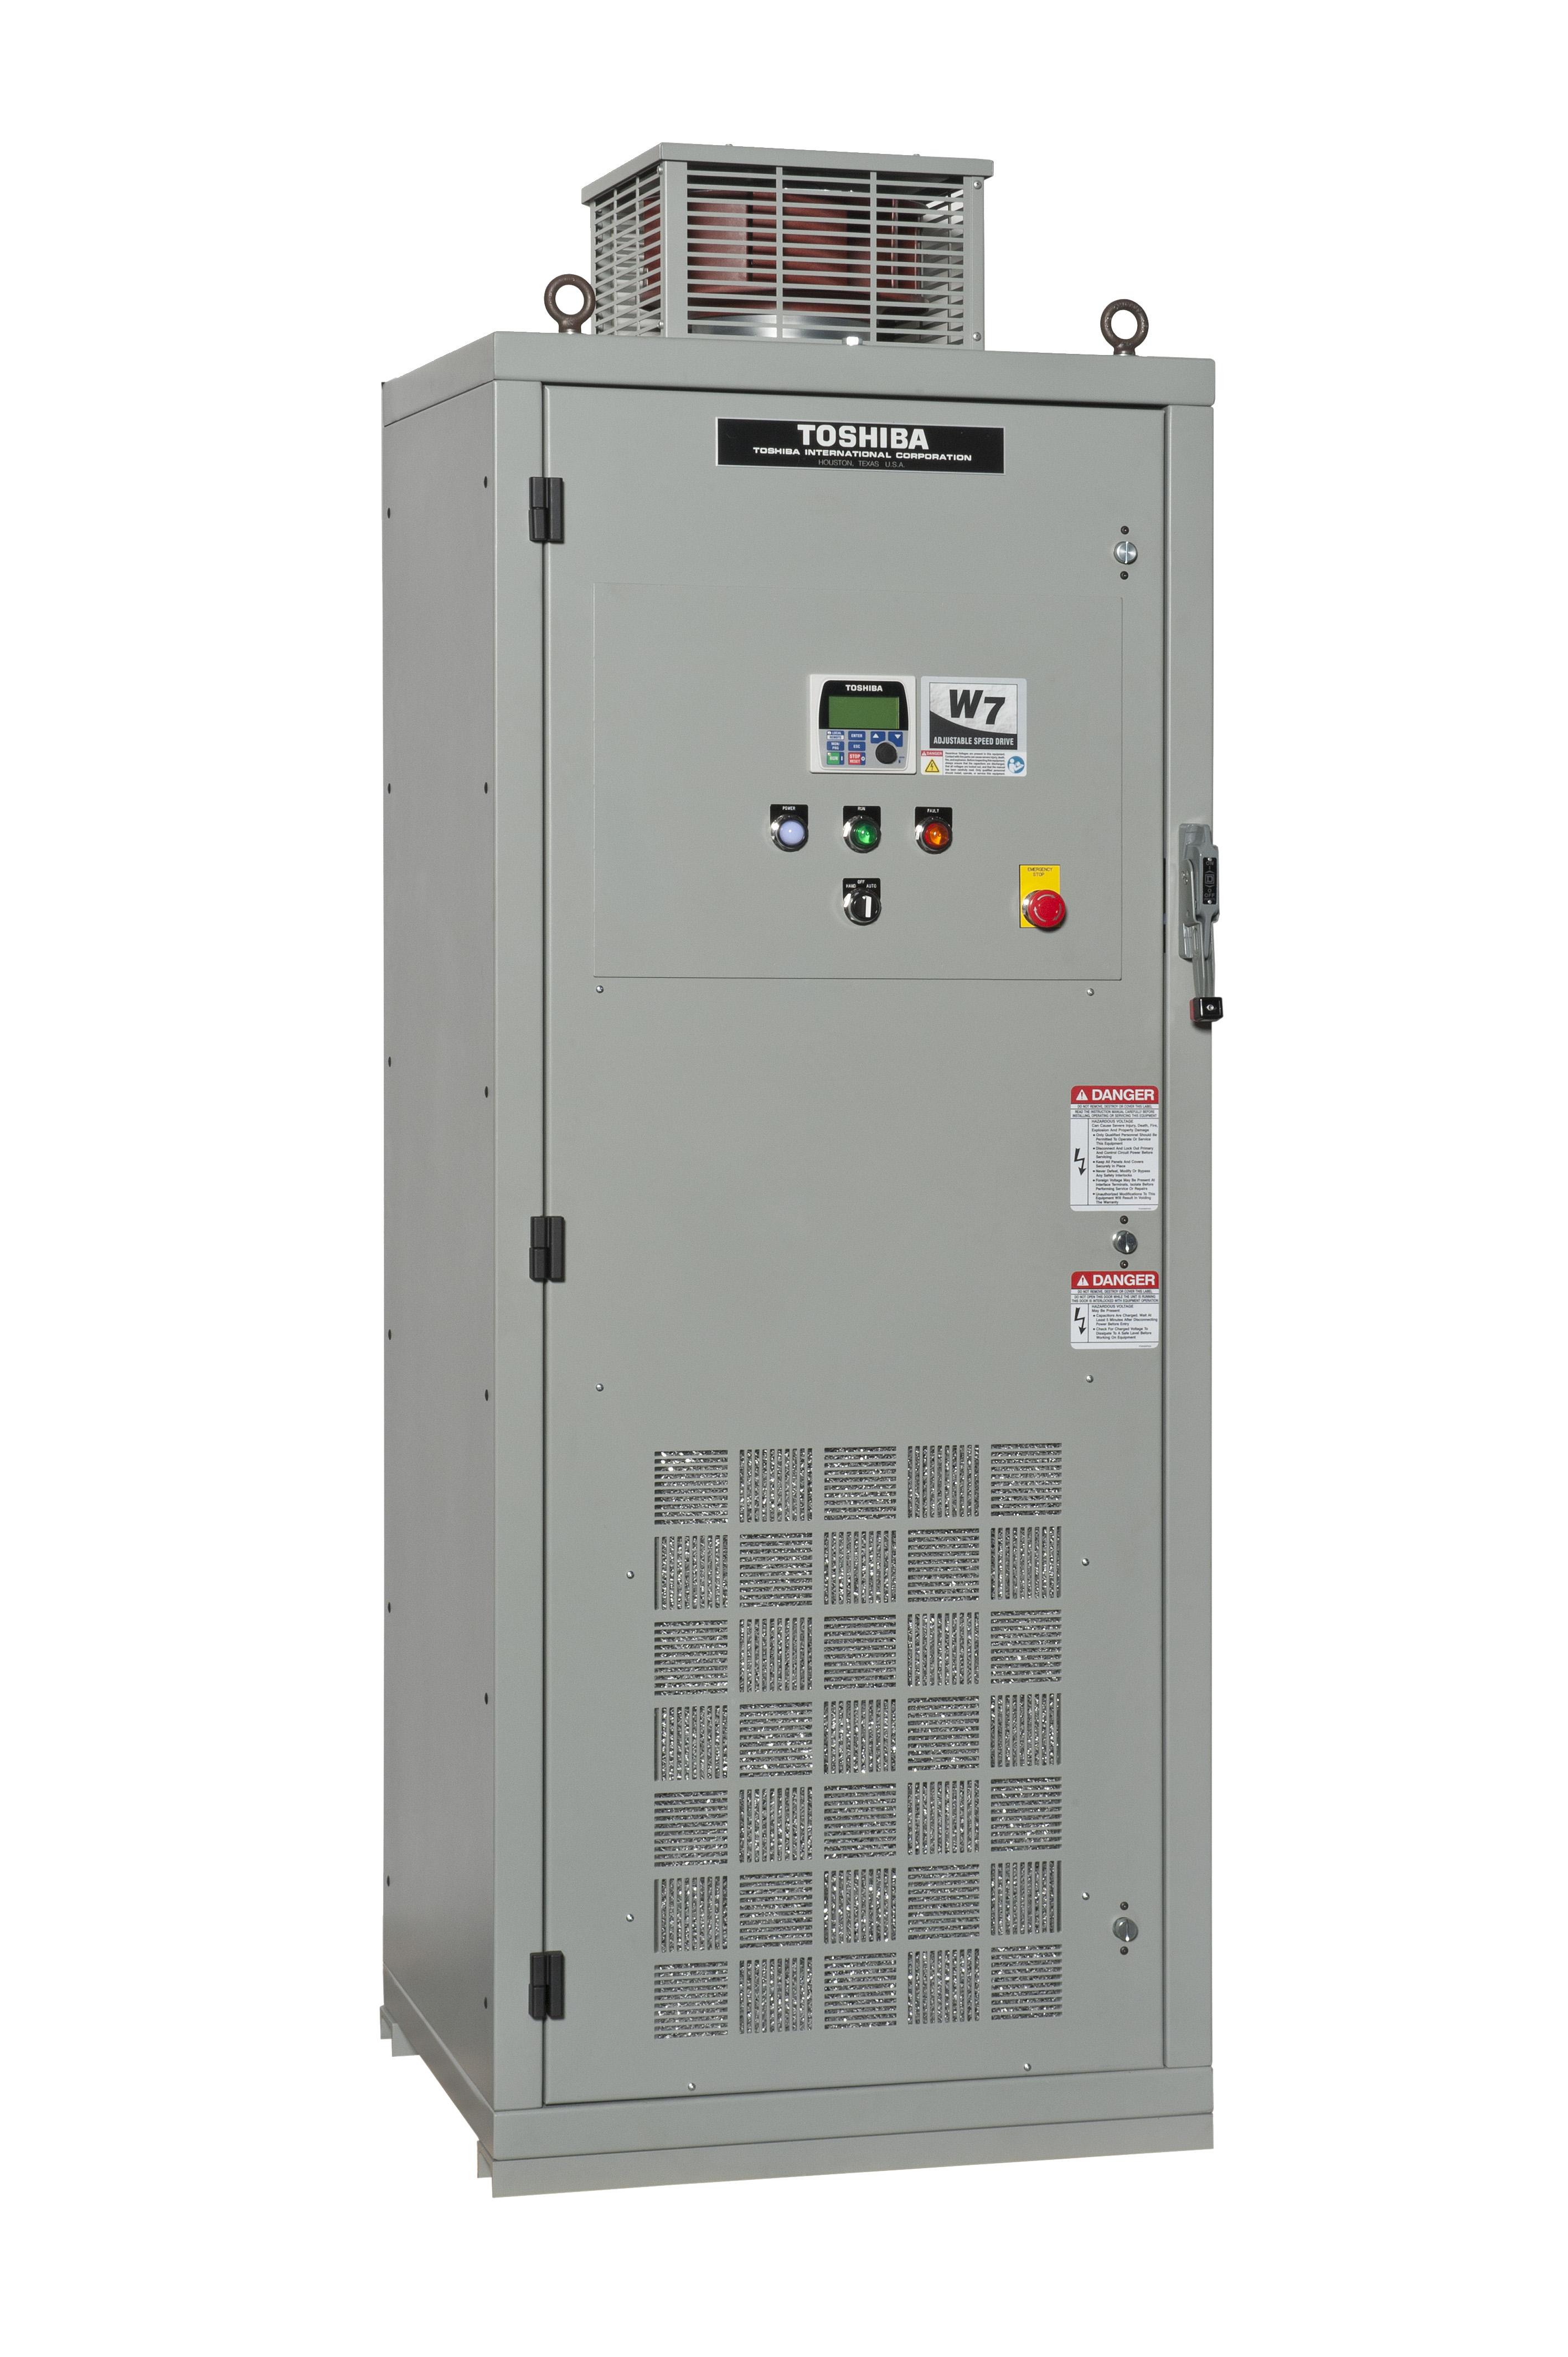 Toshiba G7 Wiring Diagram Libraries Pietenpol Asd Librarylow Voltage Adjustable Speed Drives Motors W7 18